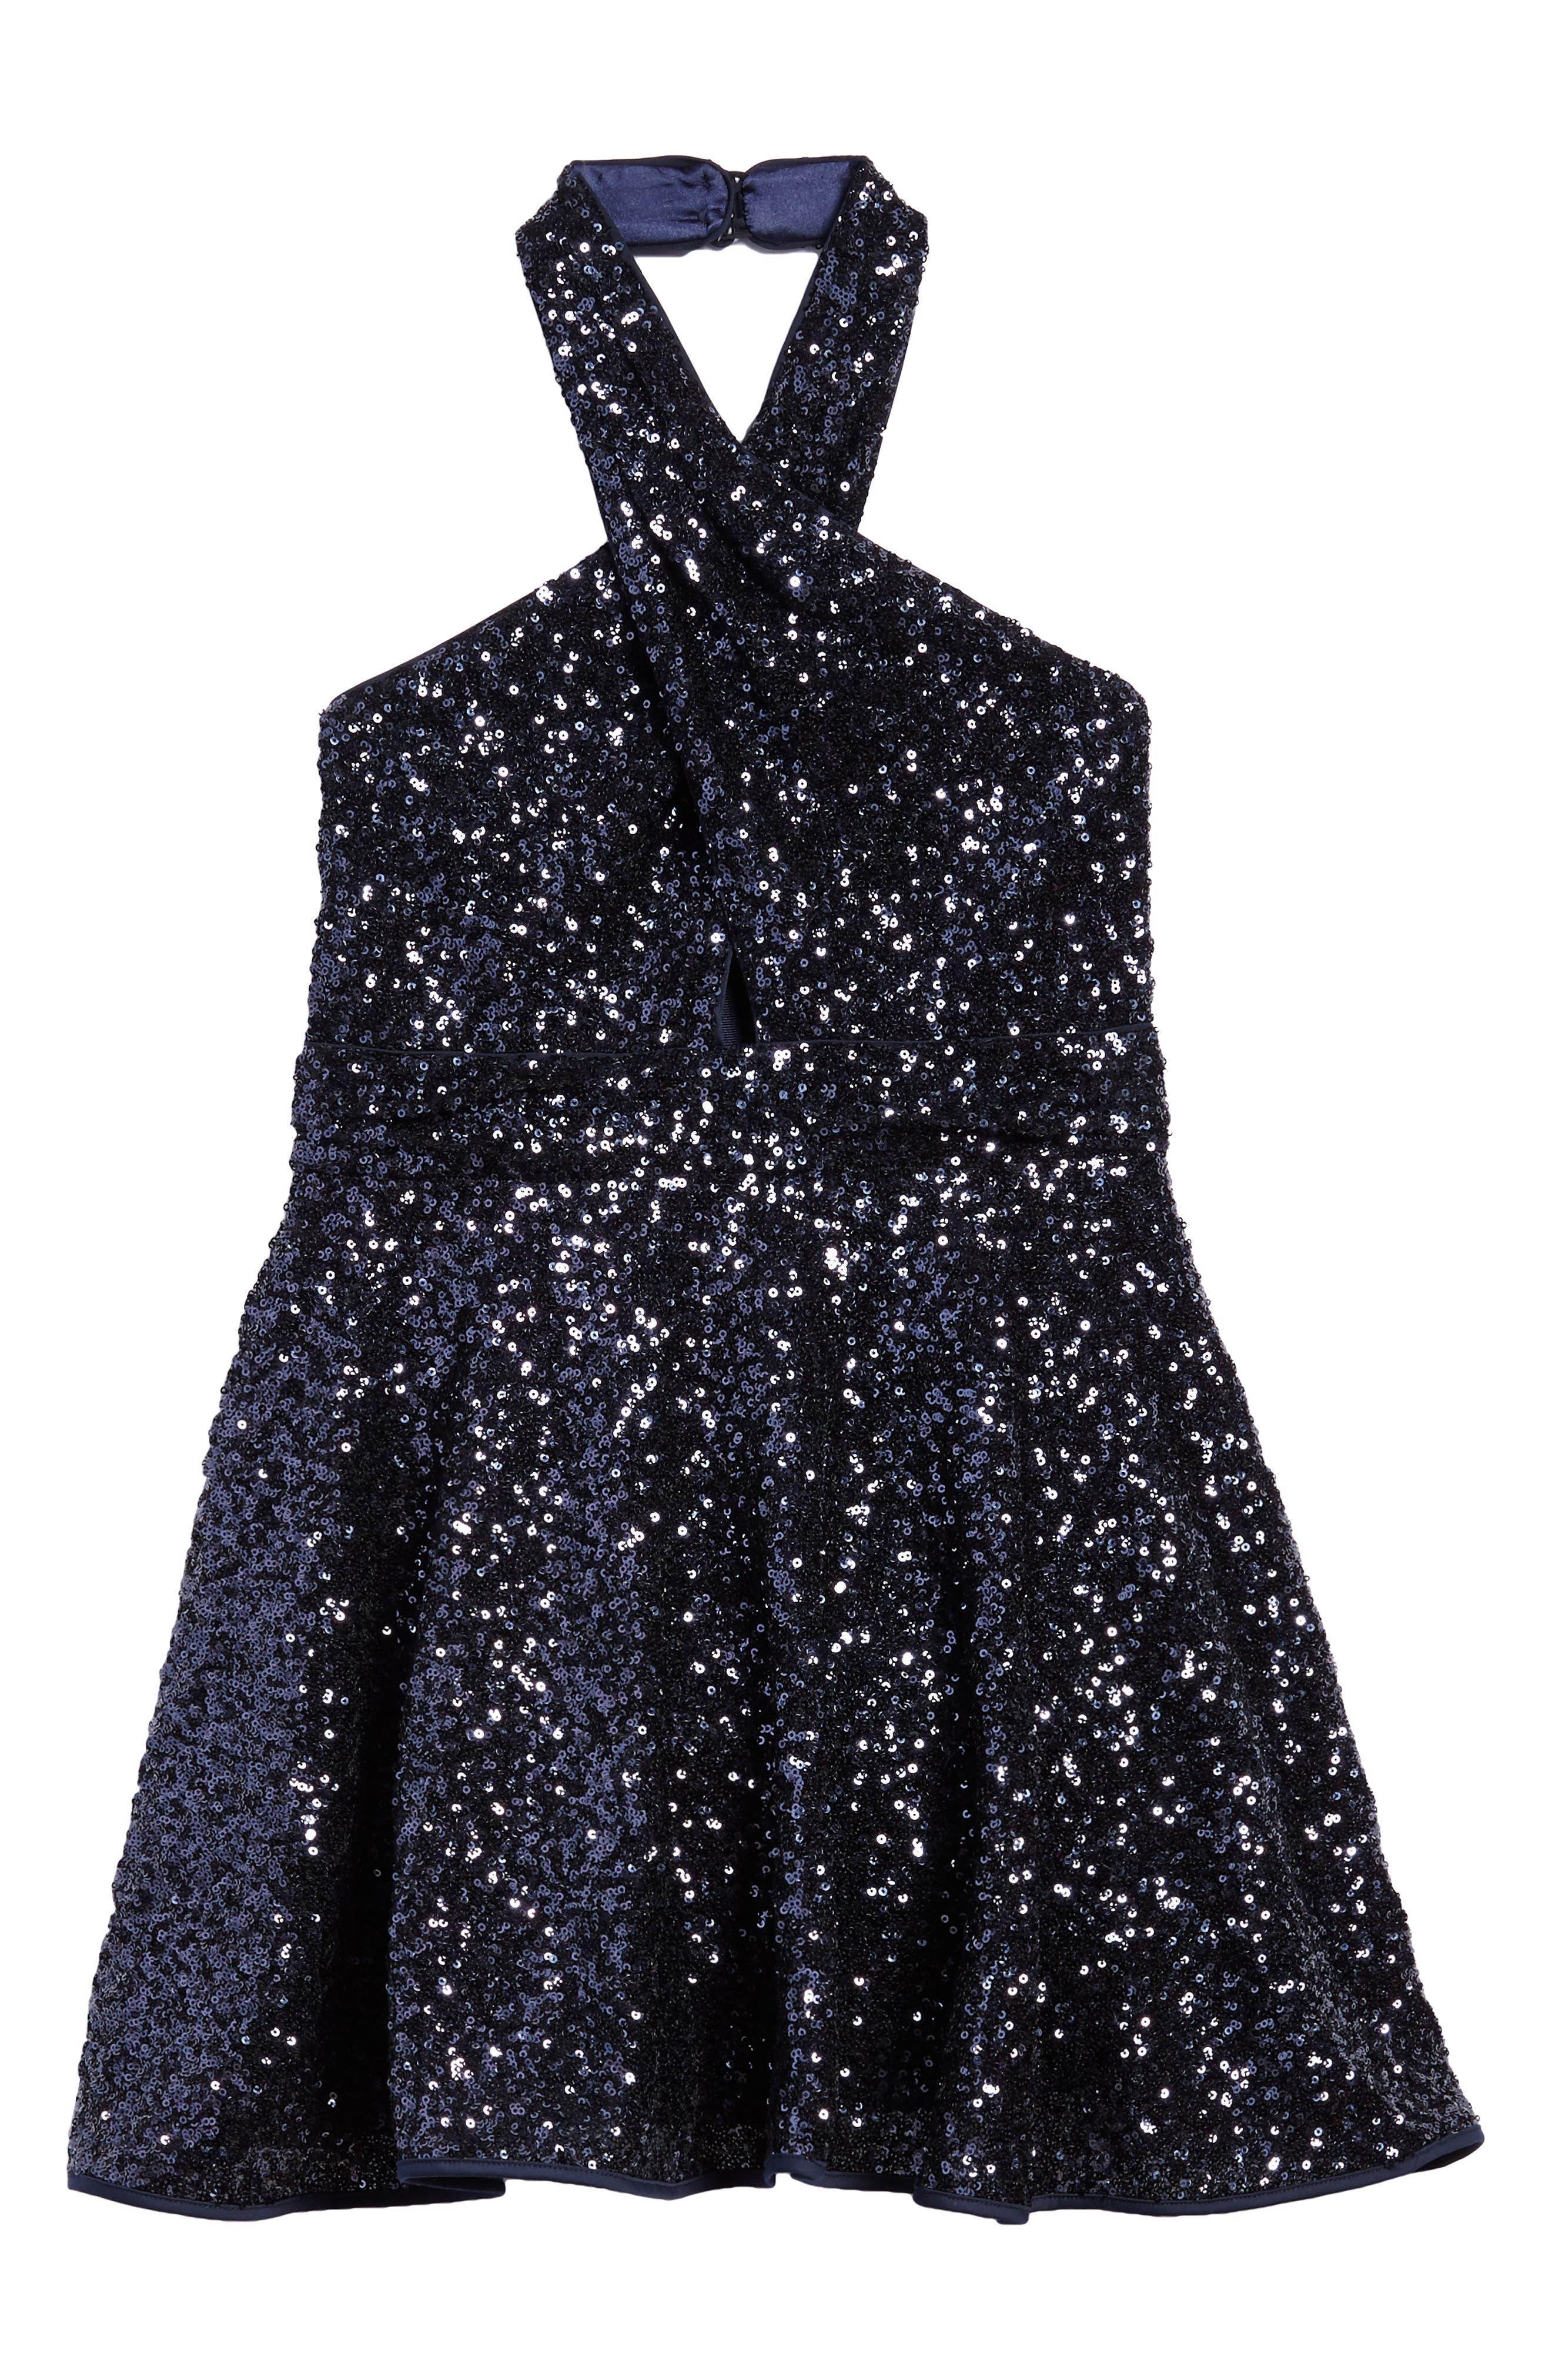 Alternate Image 1 Selected - Milly Minis Sydney Sequin Halter Dress (Big Girls)